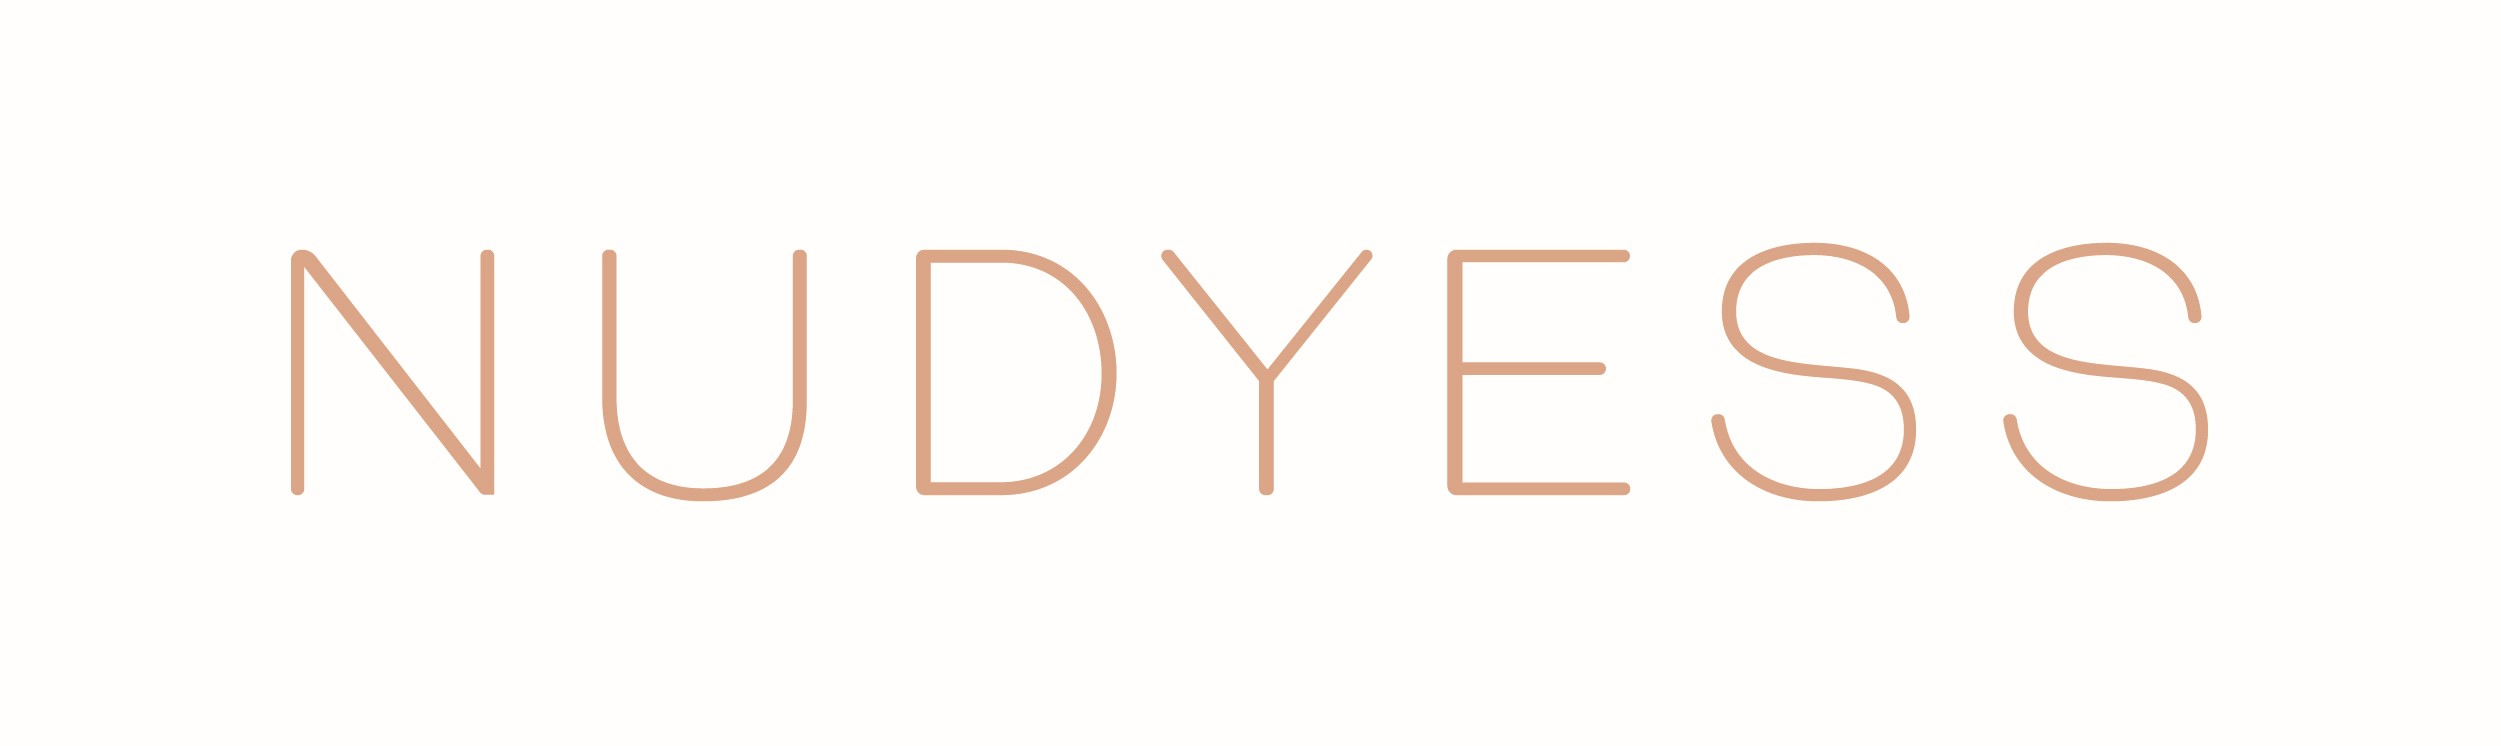 cmyk_logo cienkie-05jpg